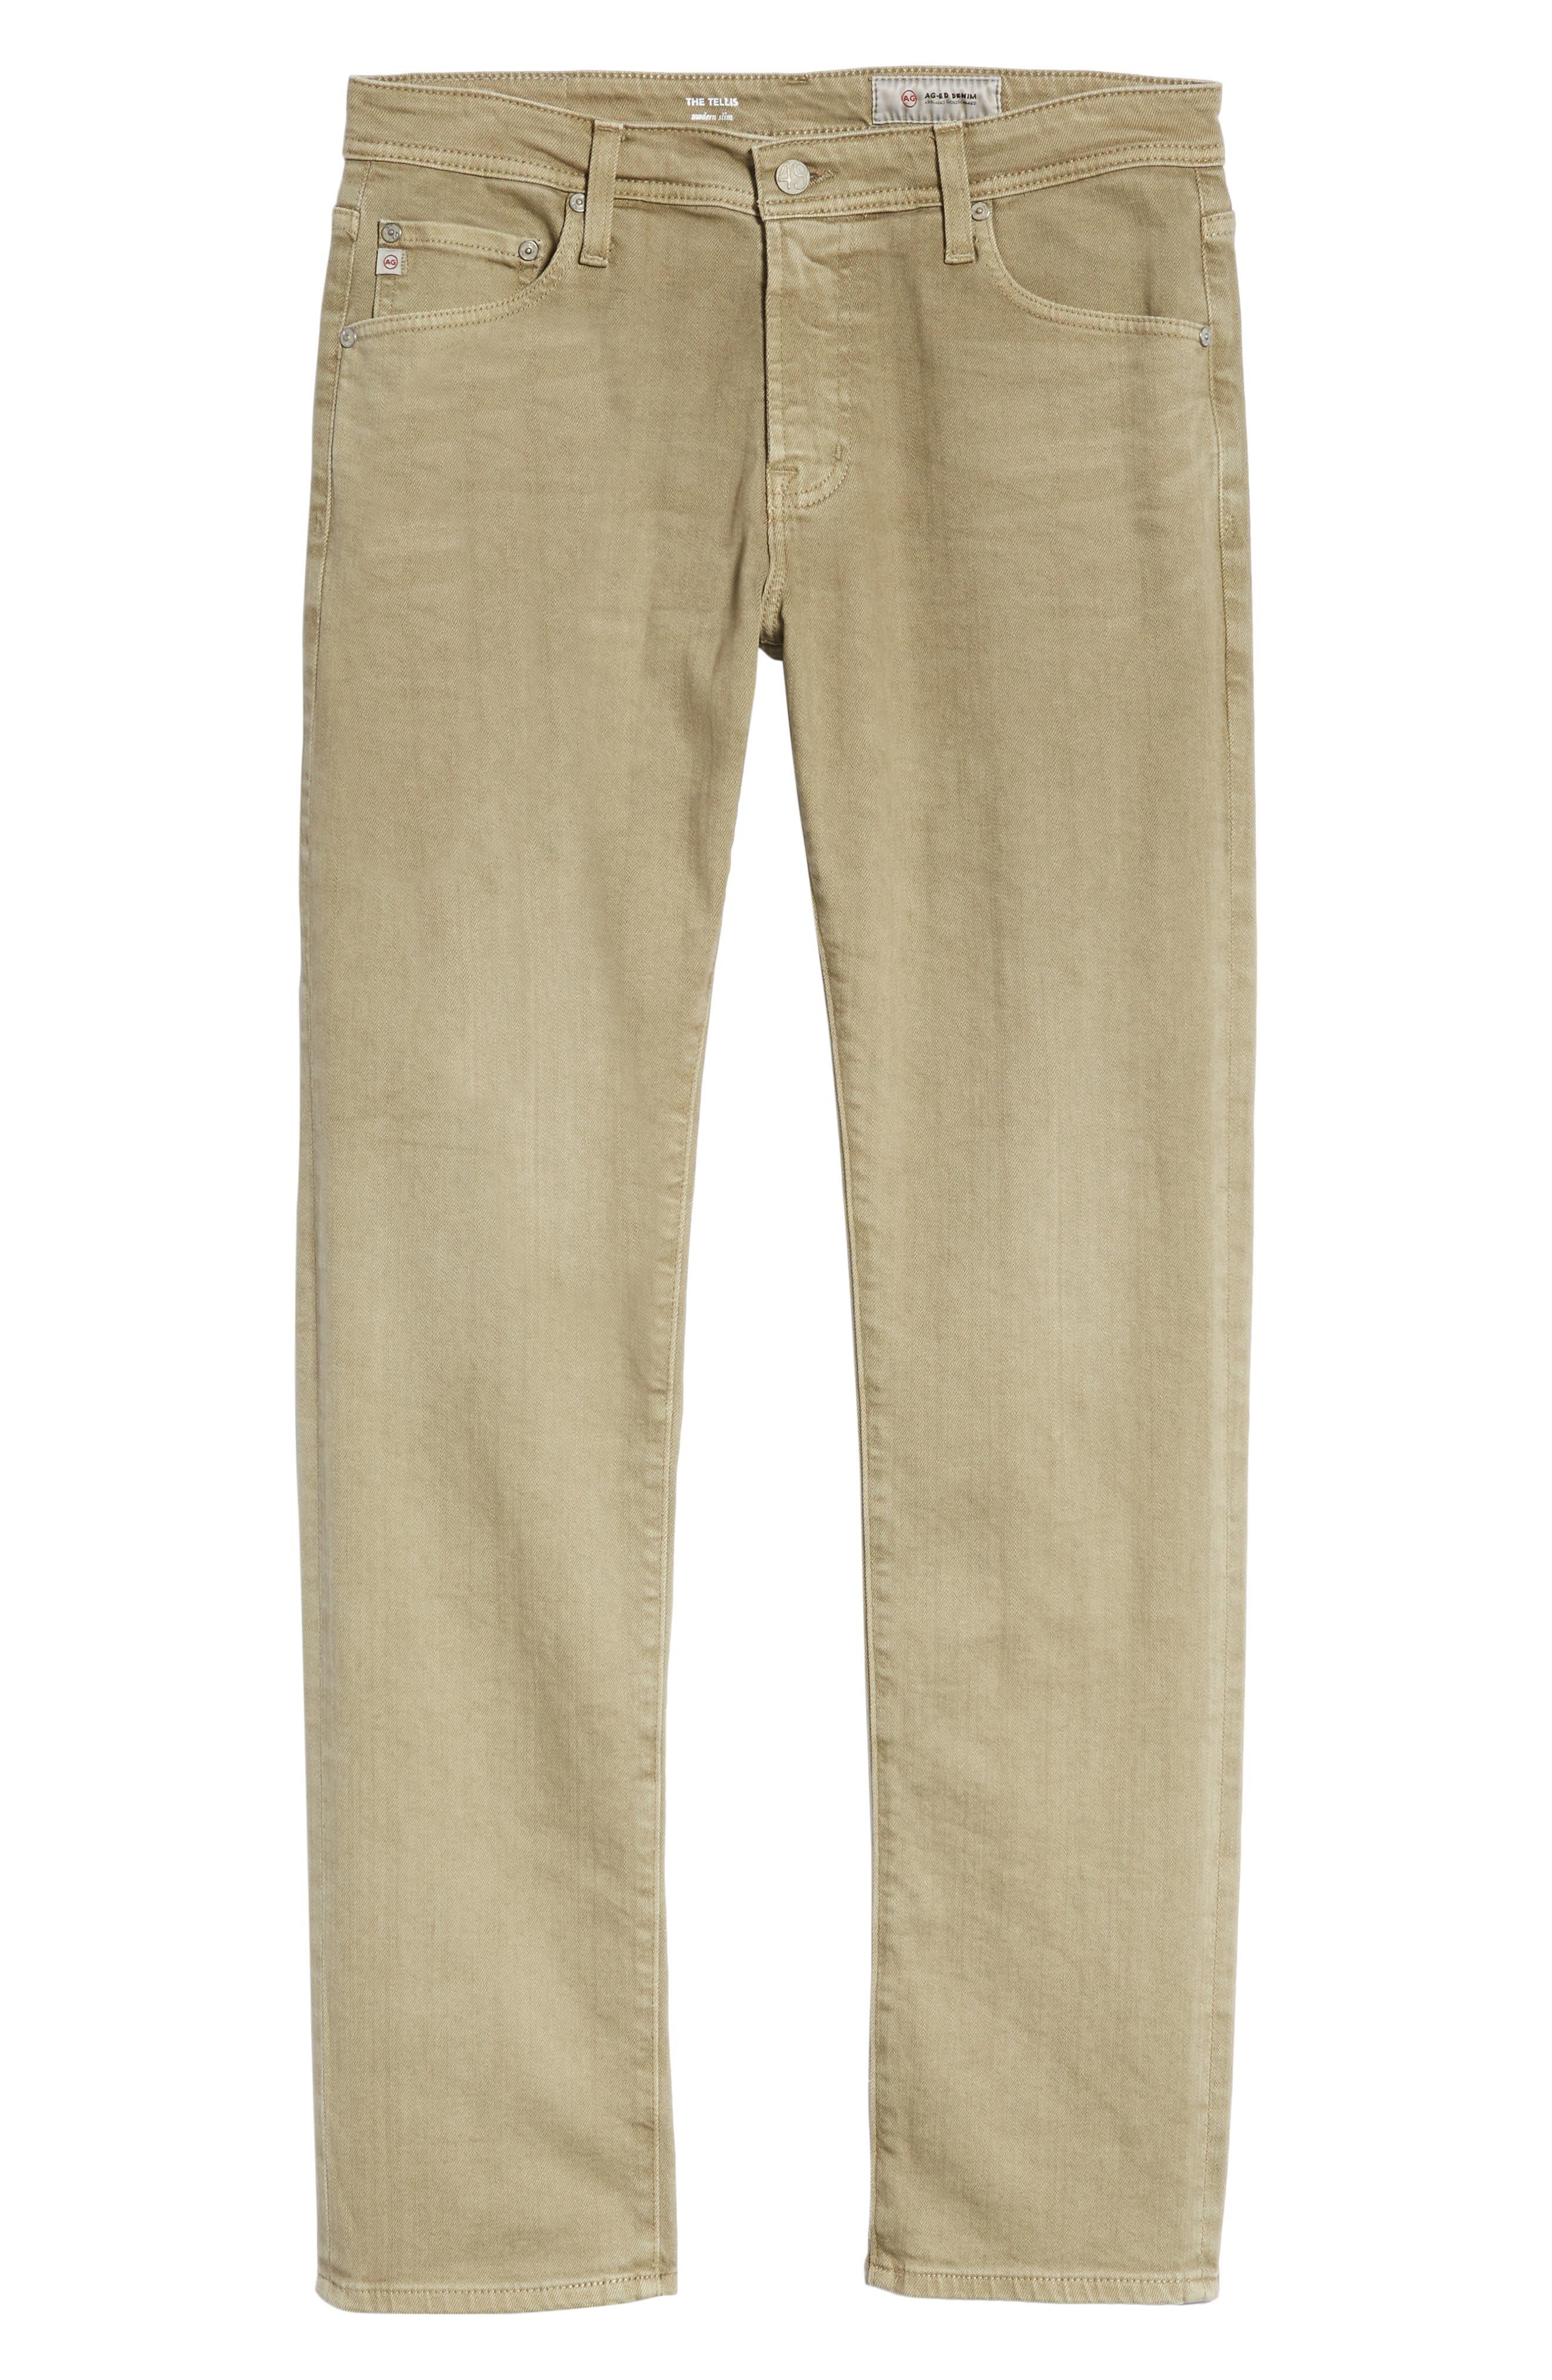 Tellis Slim Fit Jeans,                             Alternate thumbnail 6, color,                             316